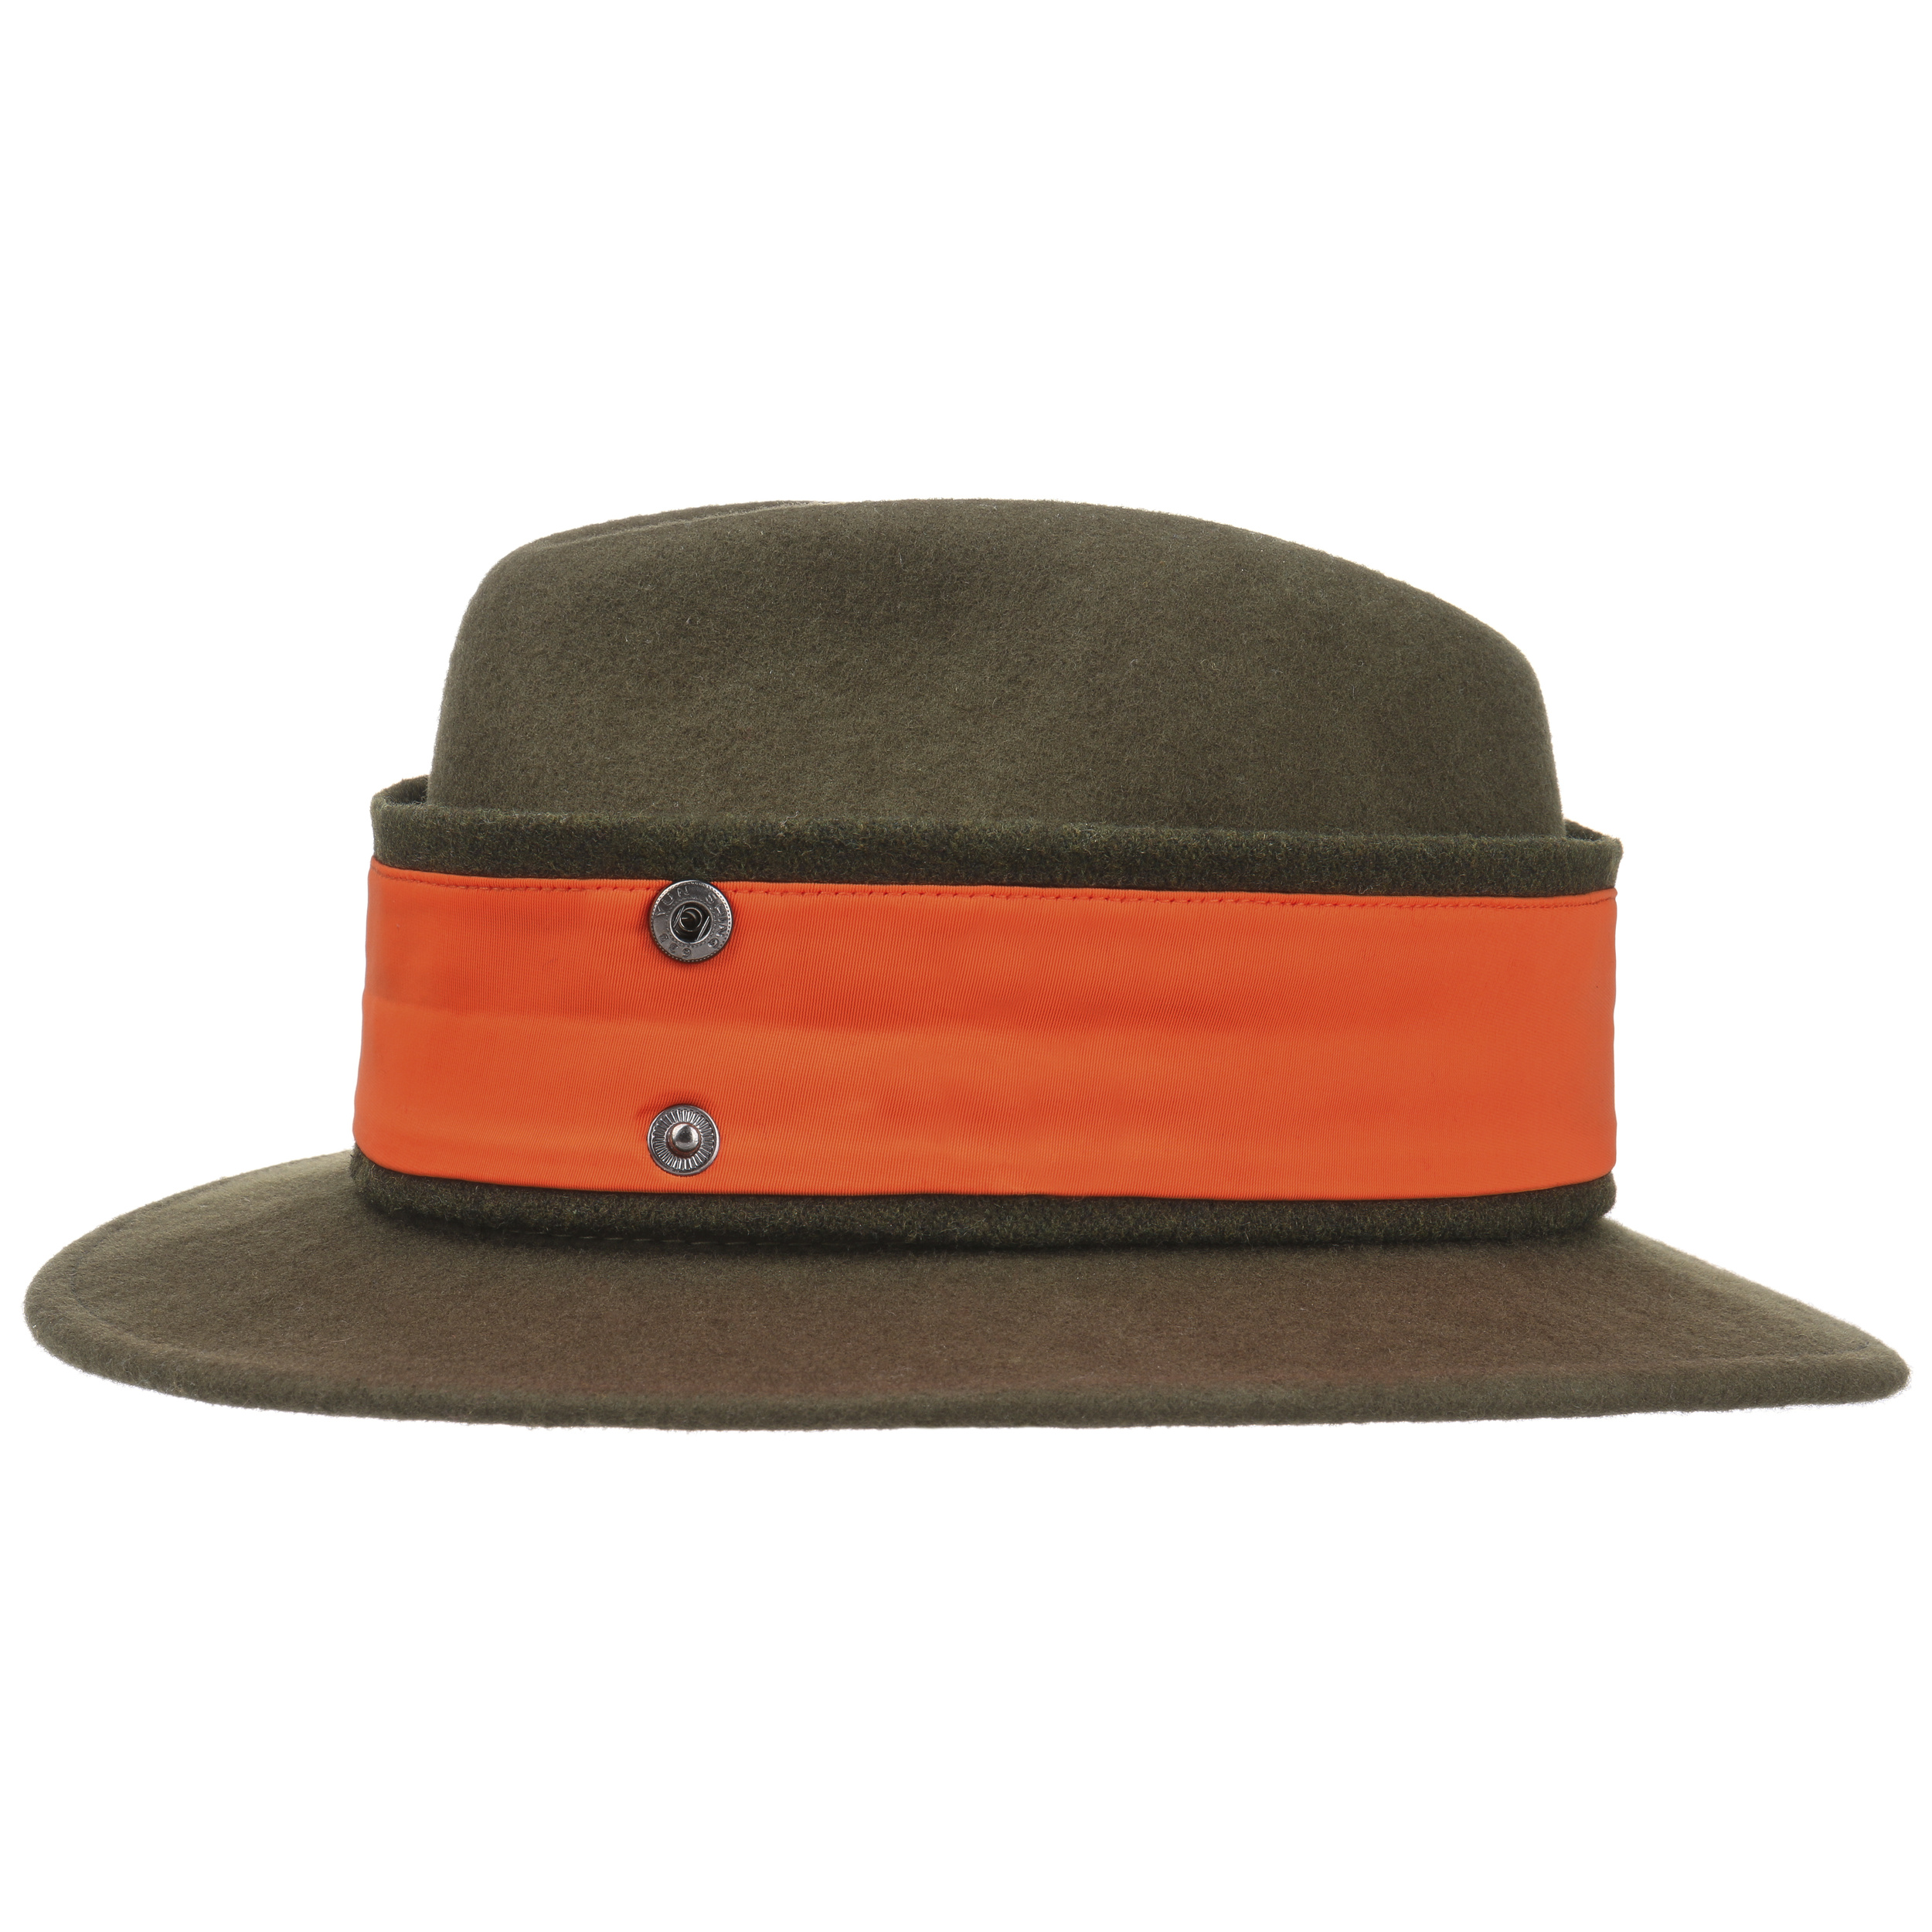 ... Sombrero para Cazar Hunting by Lierys - verde oliva 2 ... b6f90af6abf